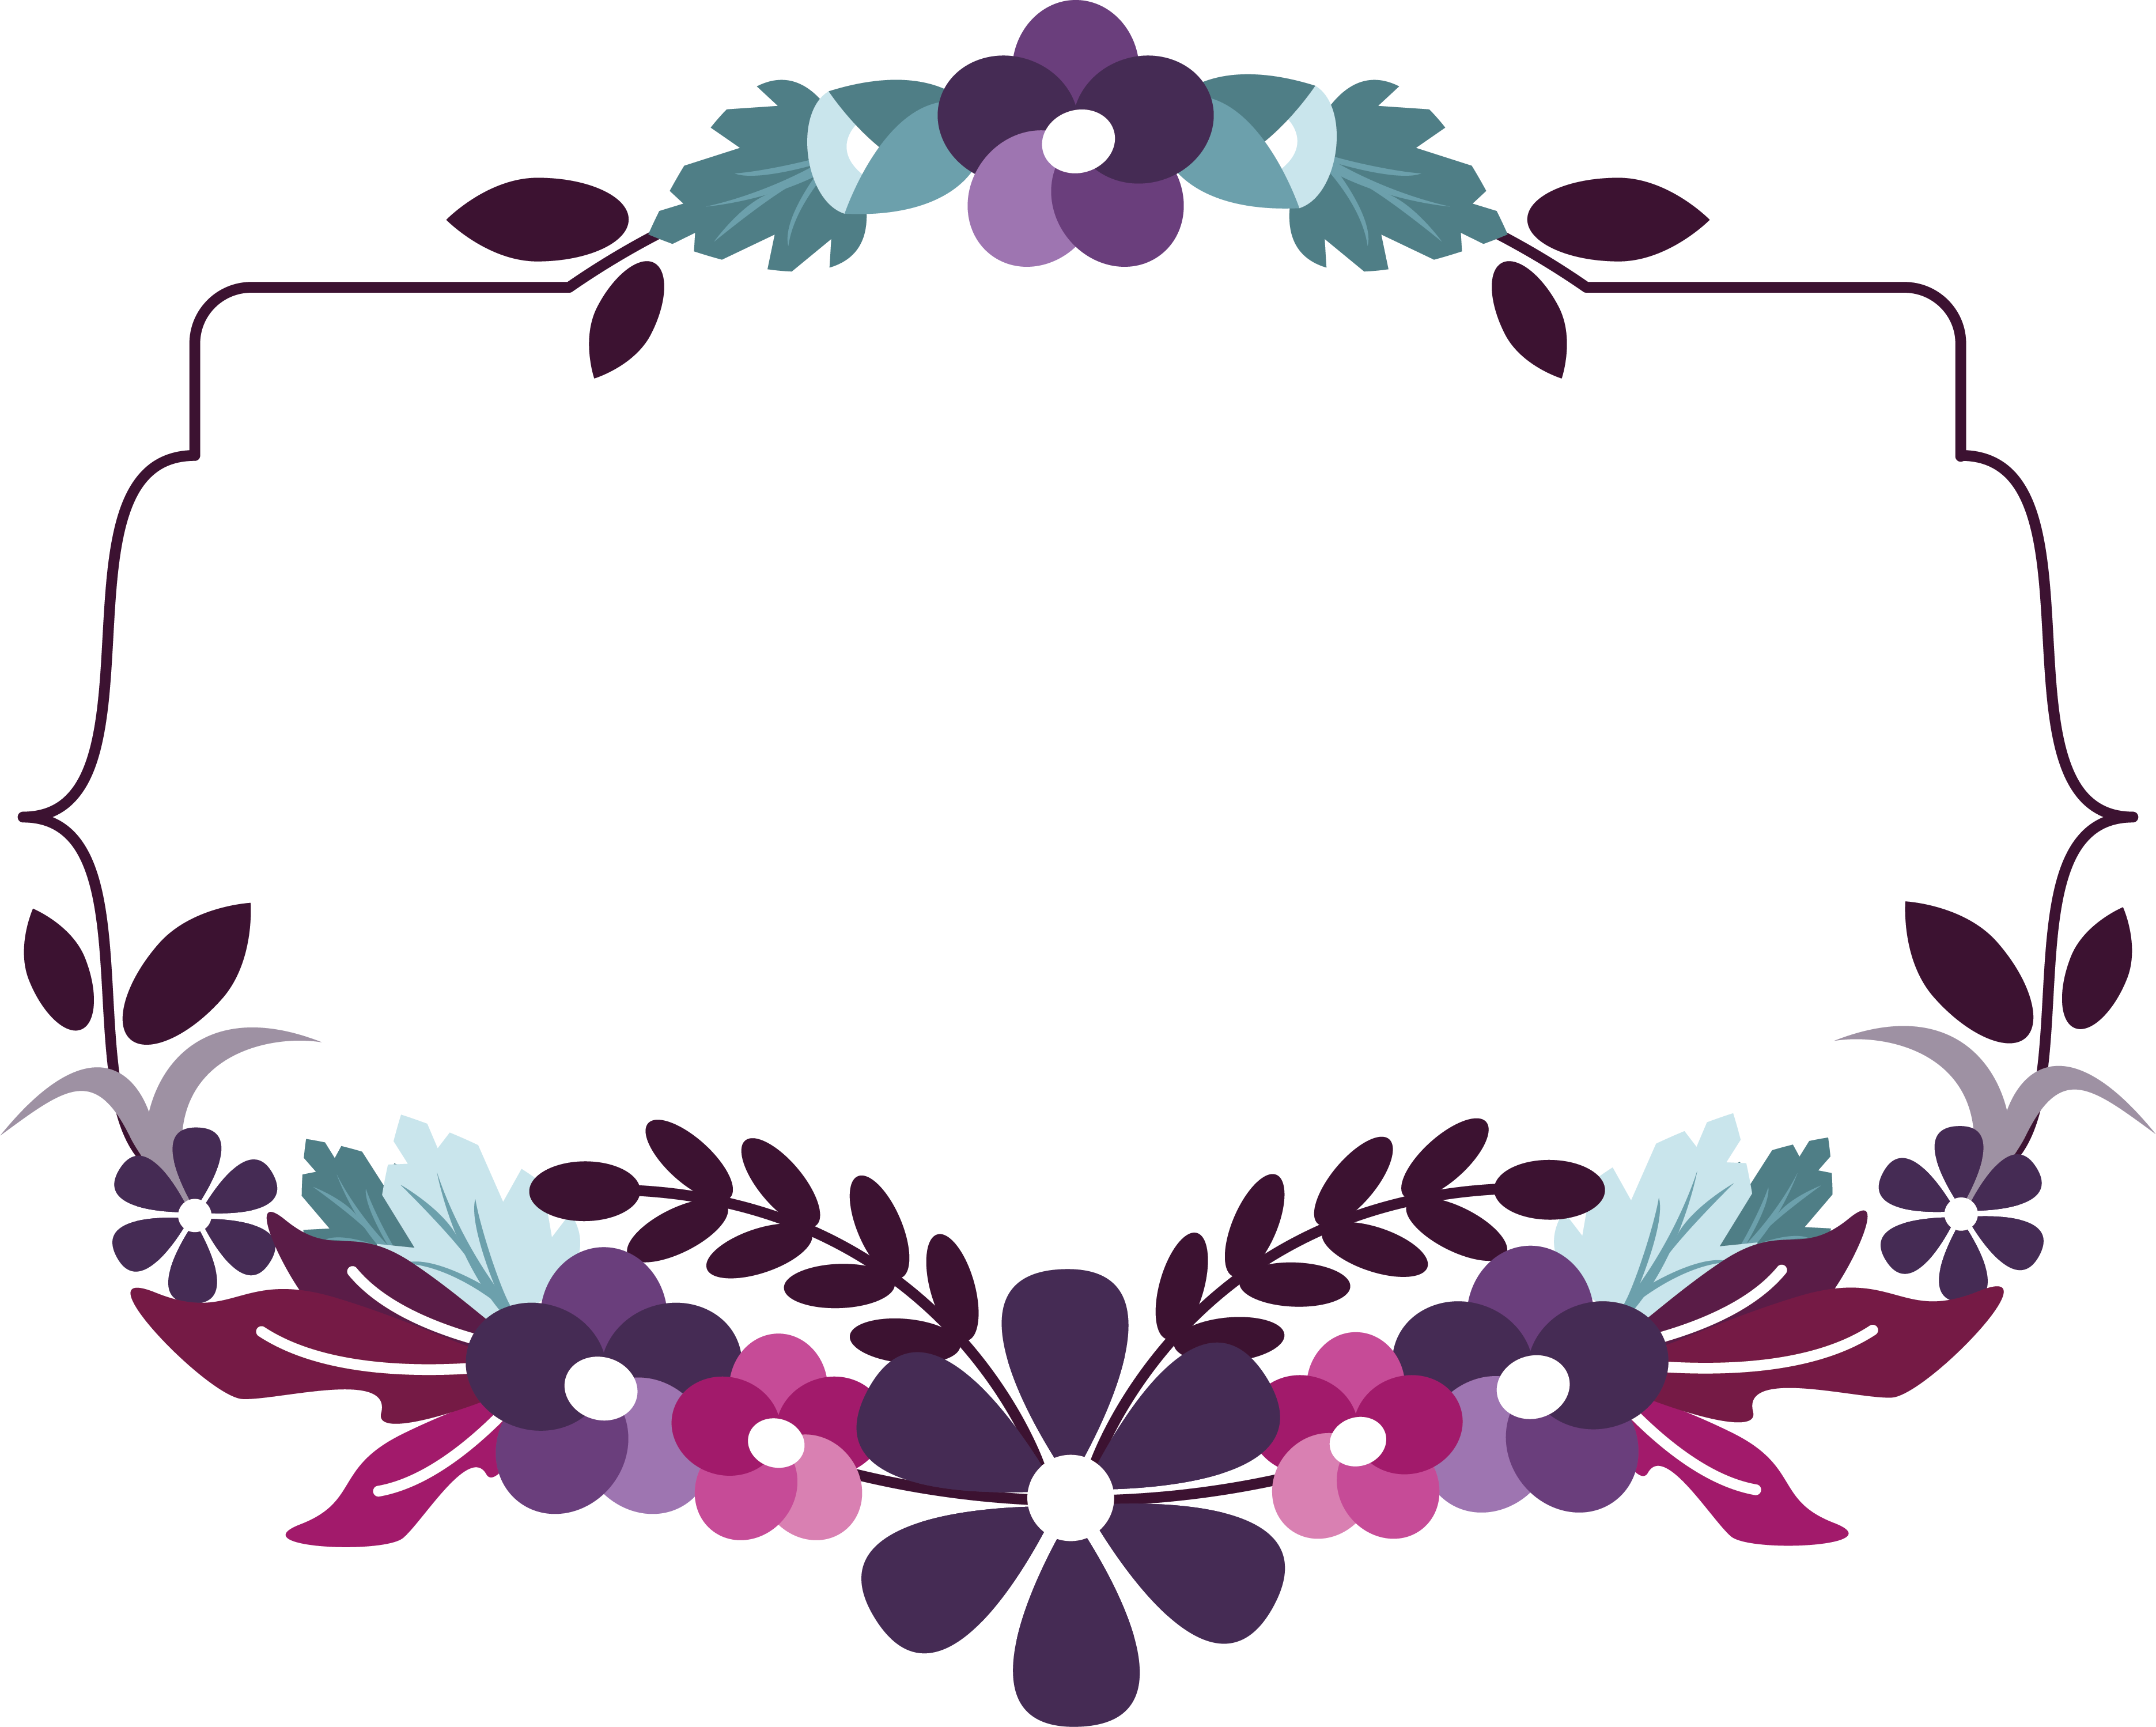 Pin By Owwa Wawa On Weddings Flower Logo Flower Border Flower Border Png